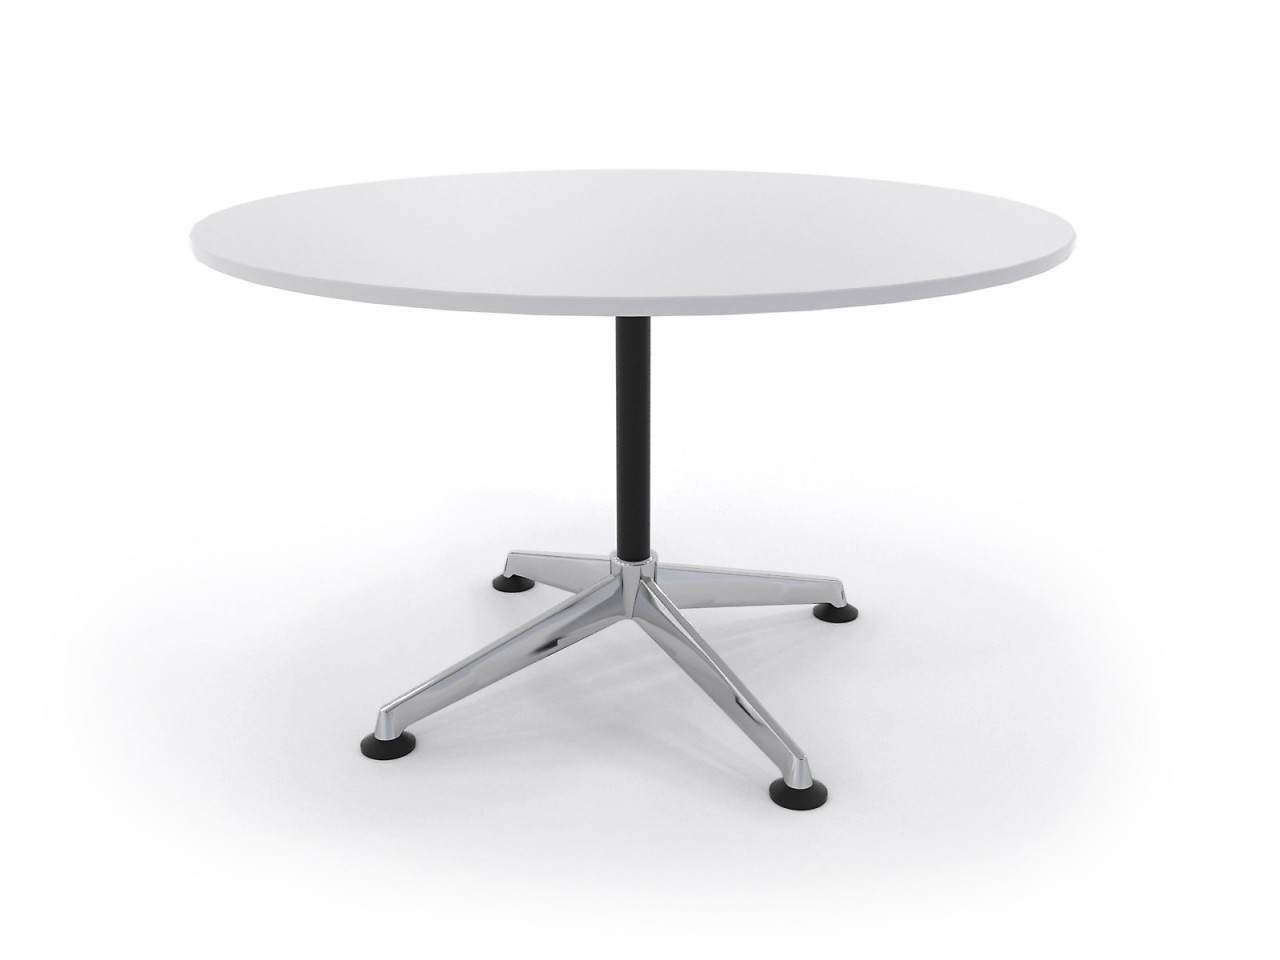 modulus-1200-pedestal-single-post-96632.1369269669.1280.1280.jpg